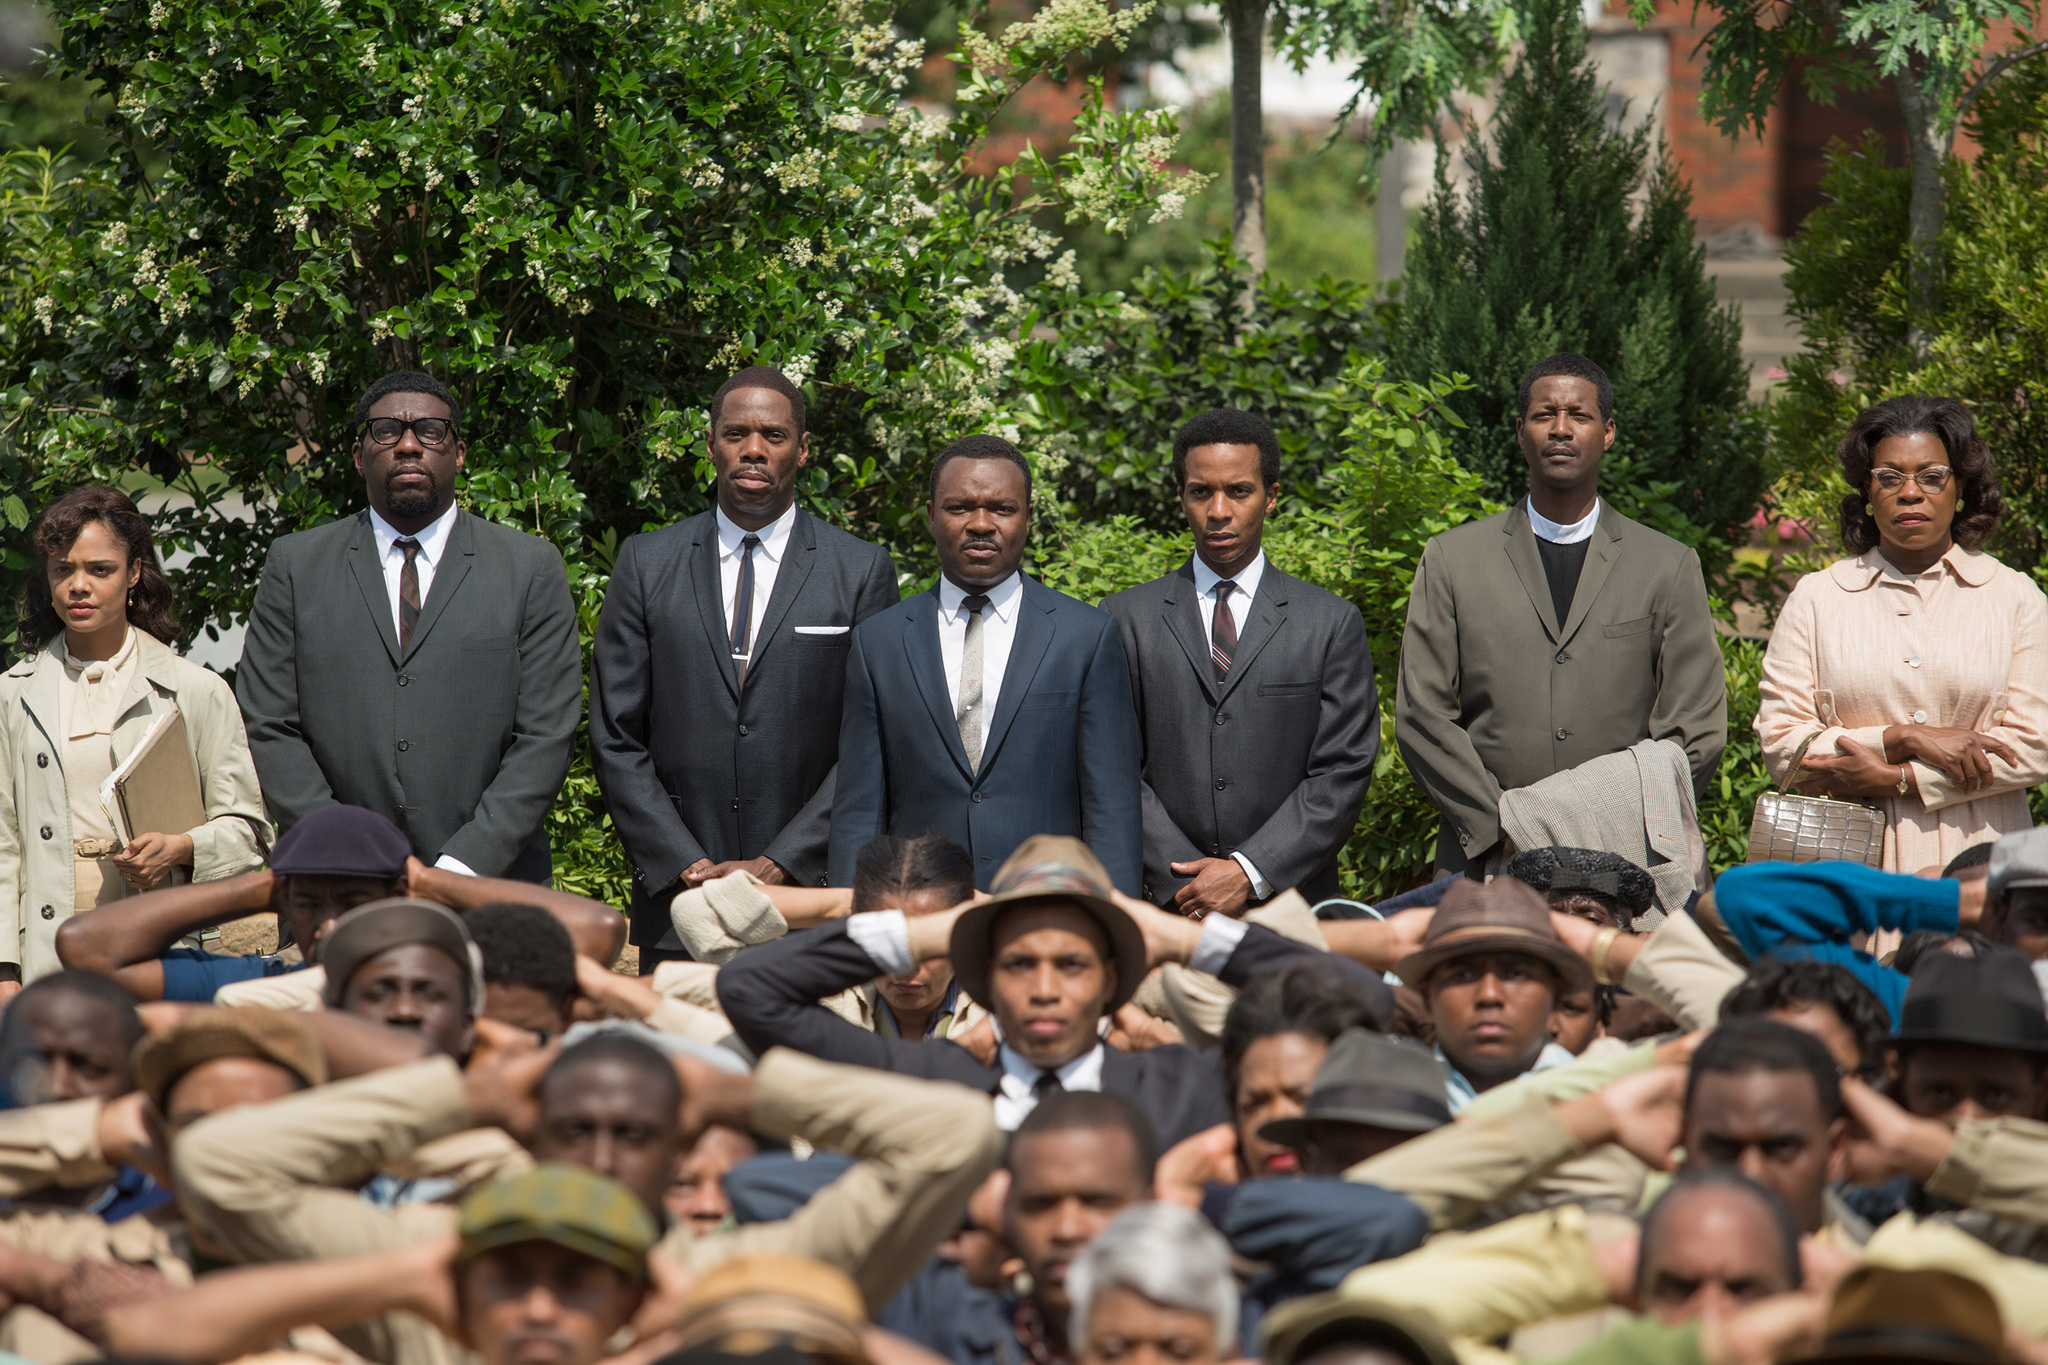 Lorraine Toussaint, Colman Domingo, David Oyelowo, Corey Reynolds, Tessa Thompson, and Lontrell Anderson in Selma (2014)